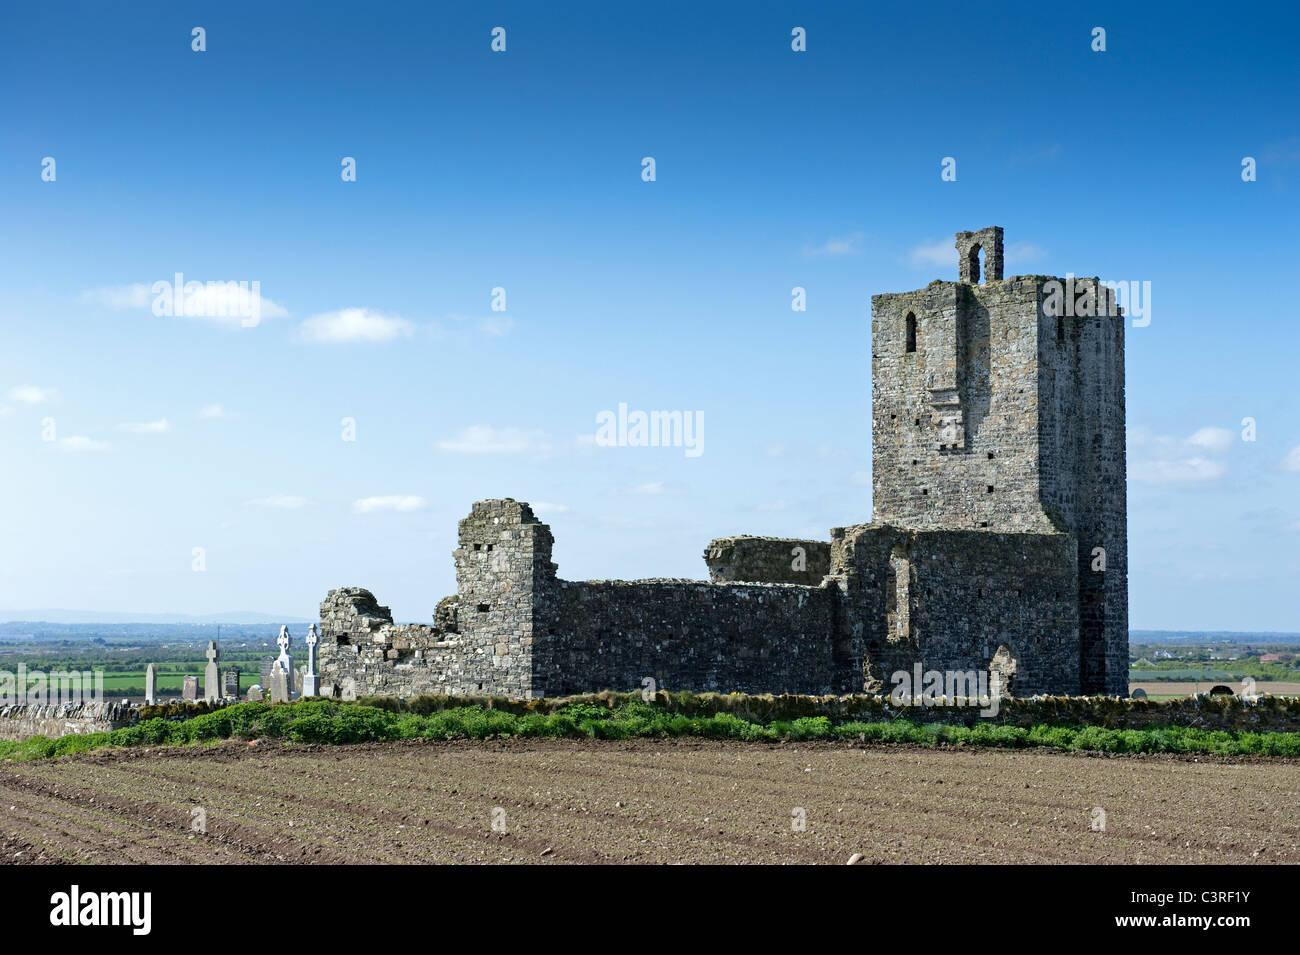 The ruins of Baldungan Castle, near Skerries, county Dublin, Ireland - Stock Image